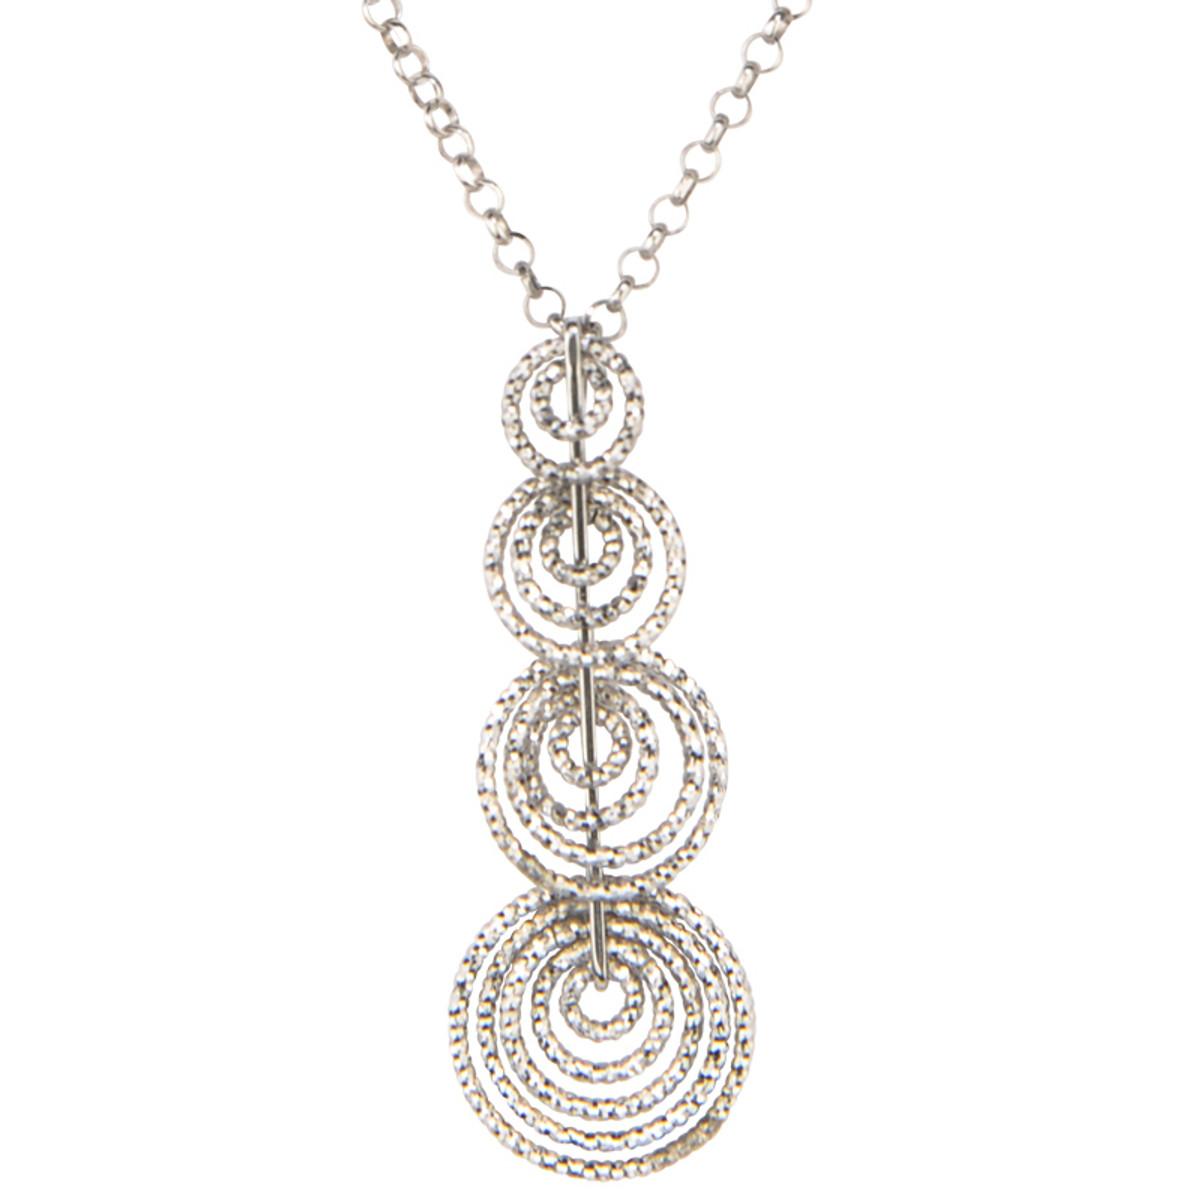 Graduating Circles Necklace, Frederic Duclos